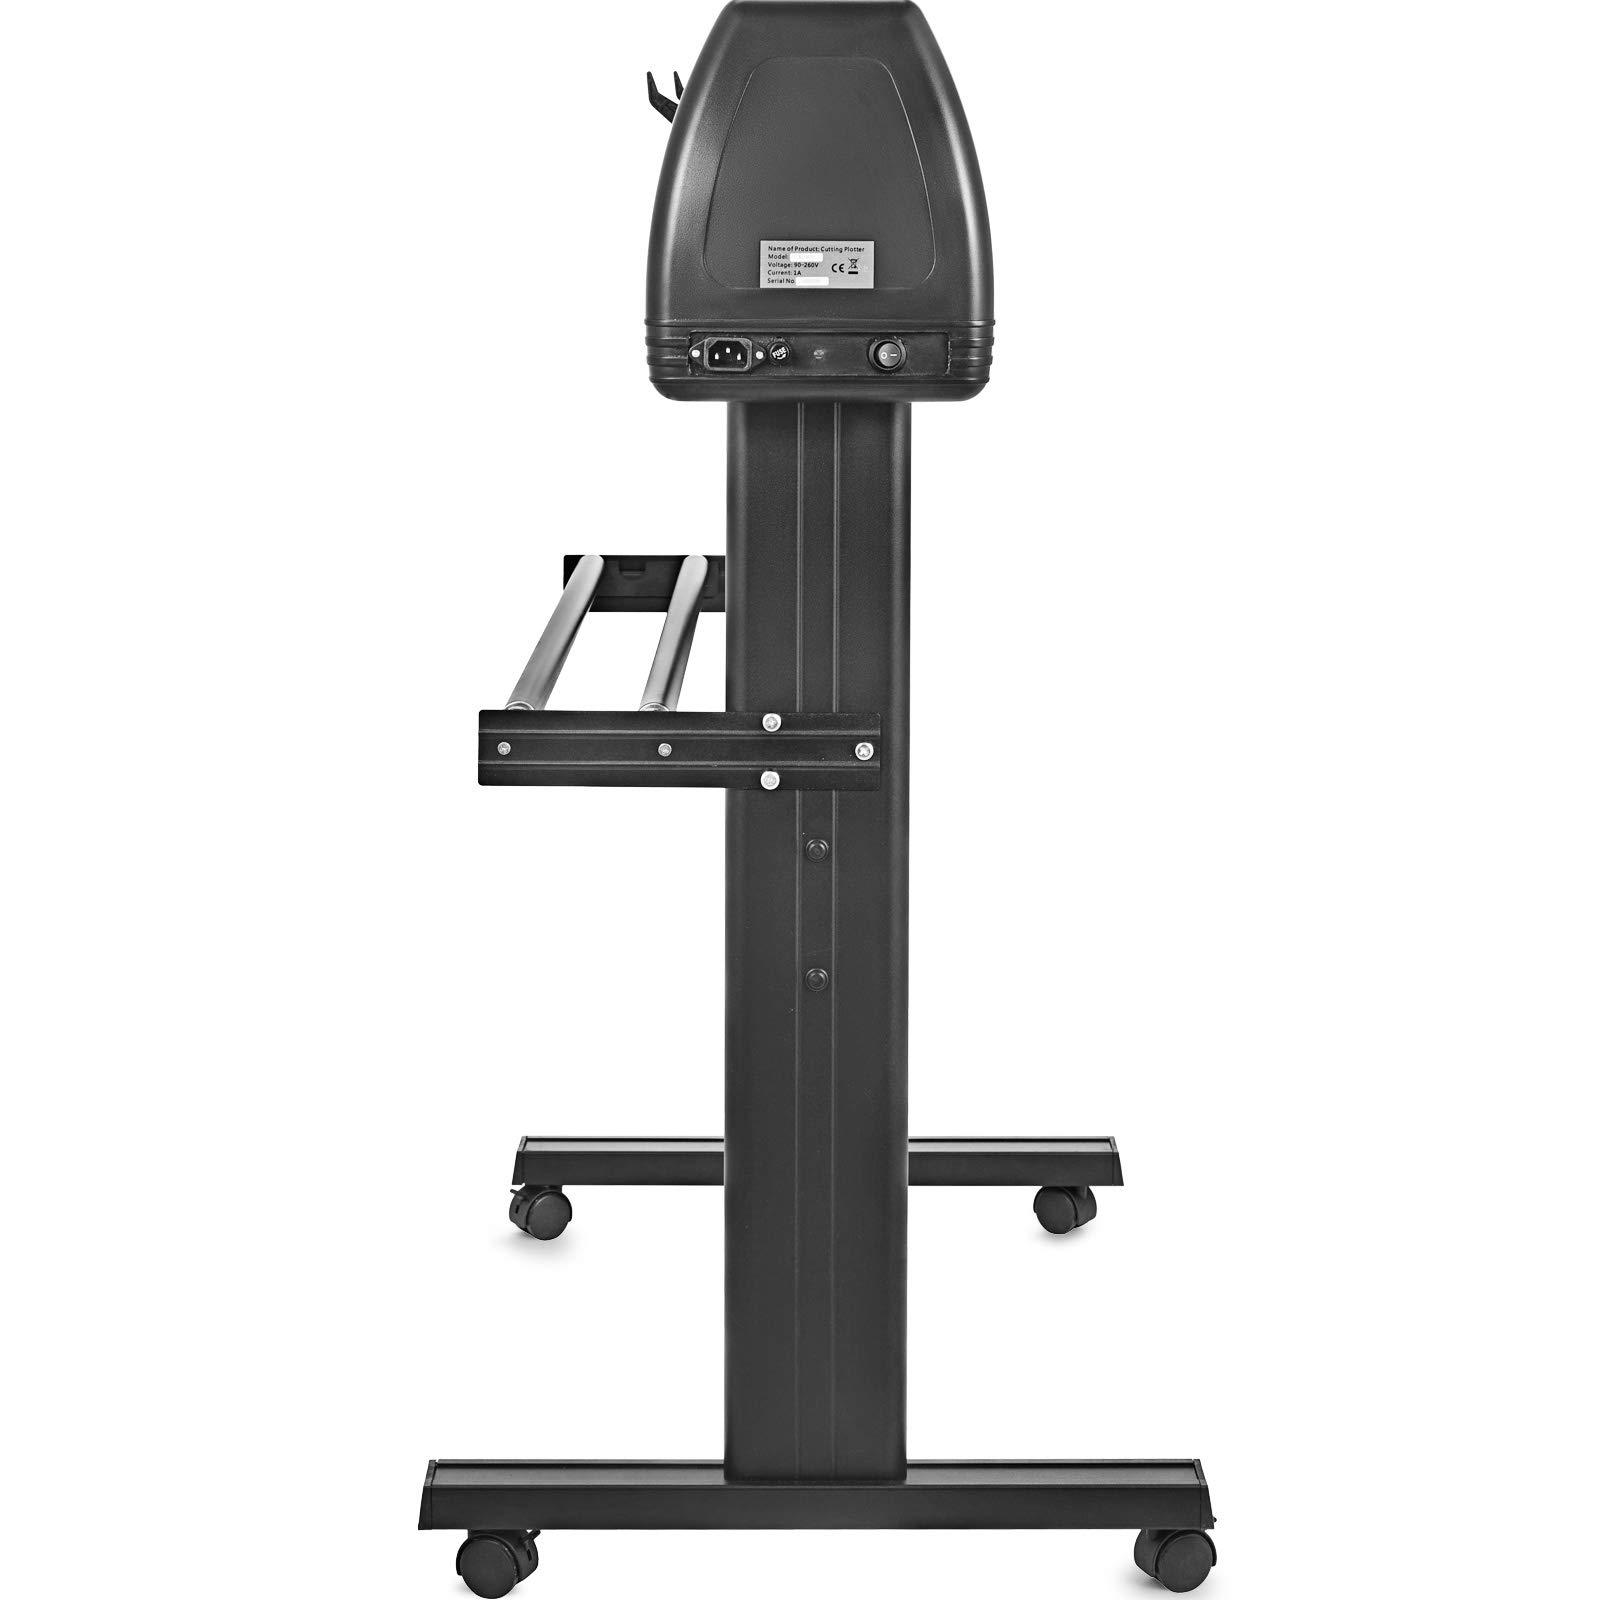 VEVOR Vinyl Cutter 53 inch Plotter Machine 1340mm Paper Feed Vinyl Cutter Plotter Signmaster Software Sign Making Machinewith Stand (53Inch Style 2) by VEVOR (Image #5)